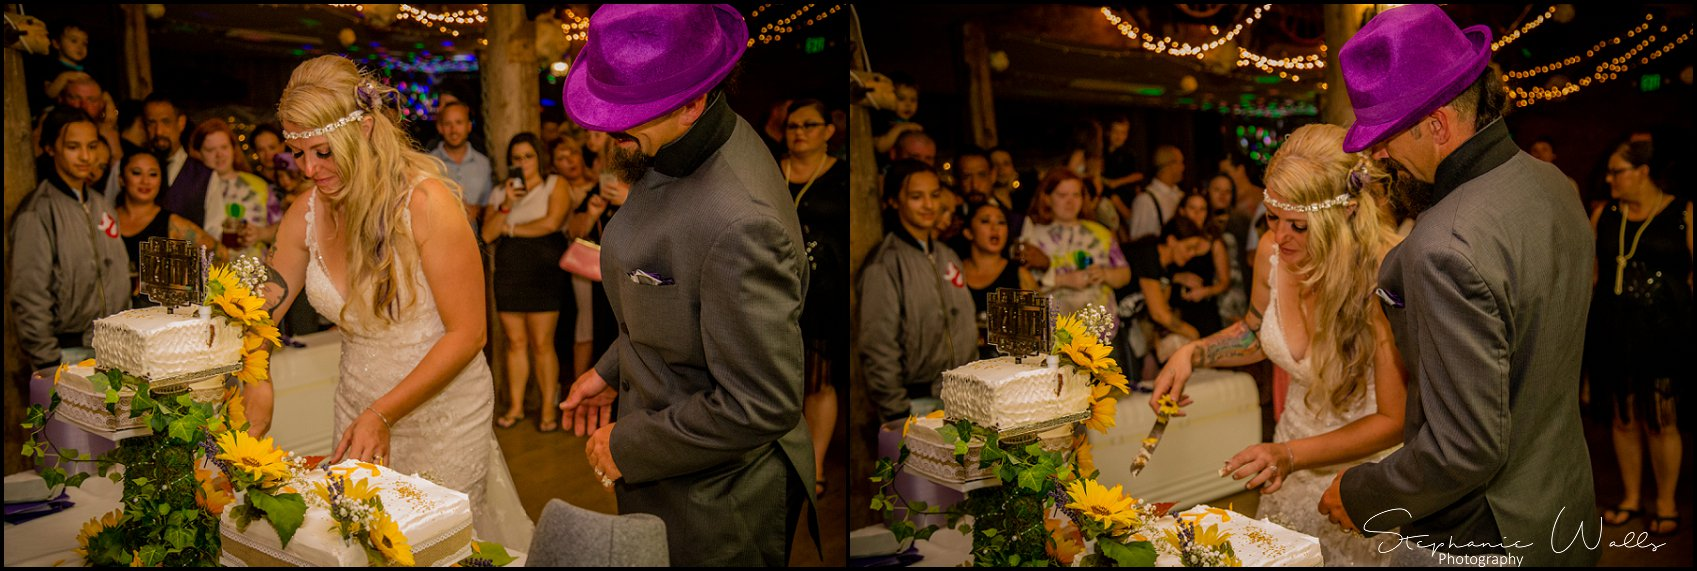 Everist Wedding 006.jpg Patti & Bobbys | Troll Haven Castle & Bandy Farms | Sequim, Wa Wedding Photographer